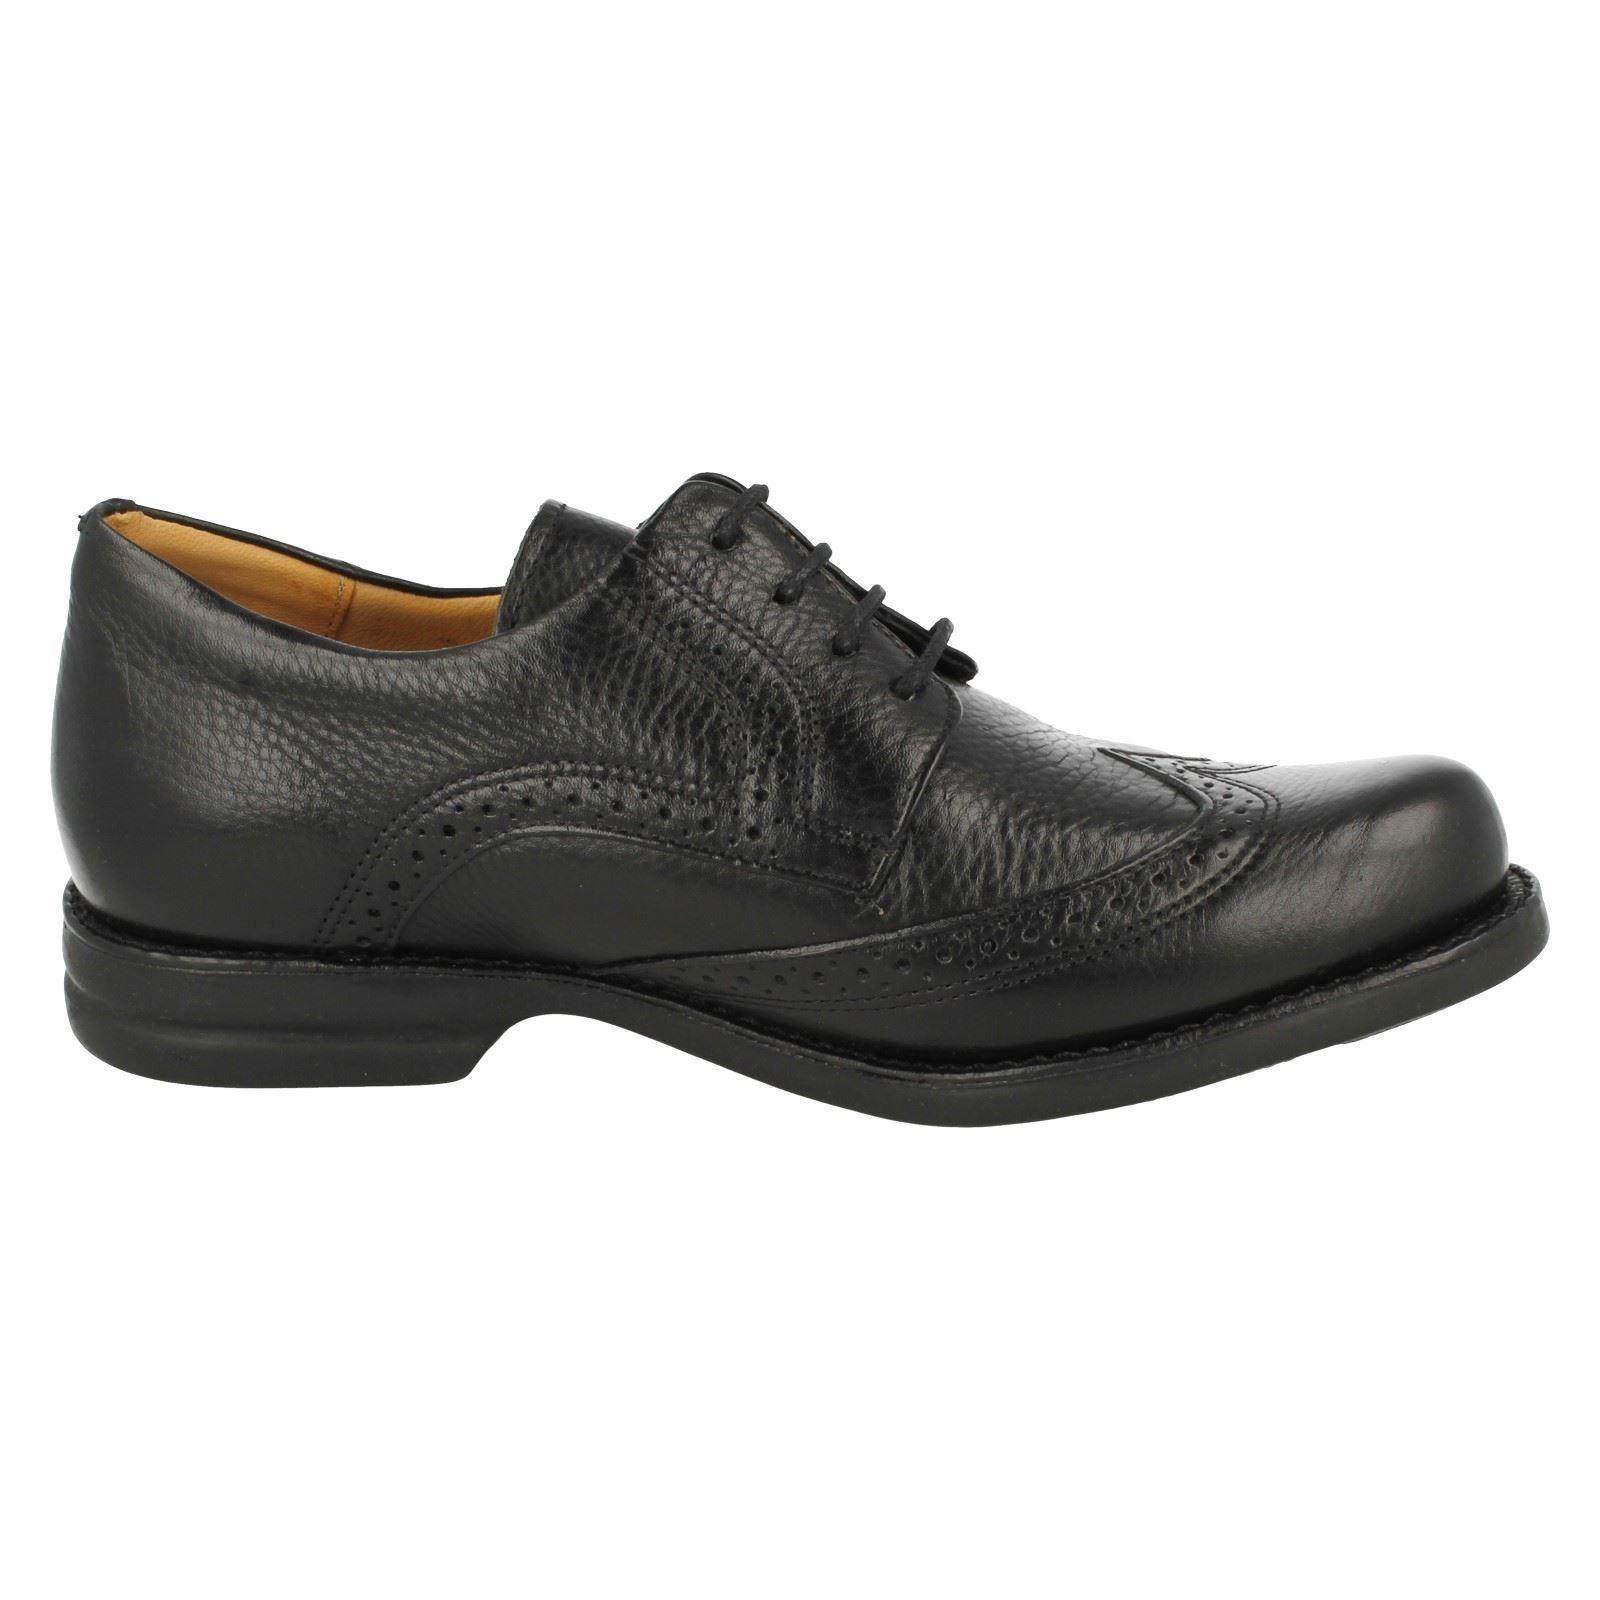 Mens Anatomic Black Leather Lace Up Brogue Shoes Palmas